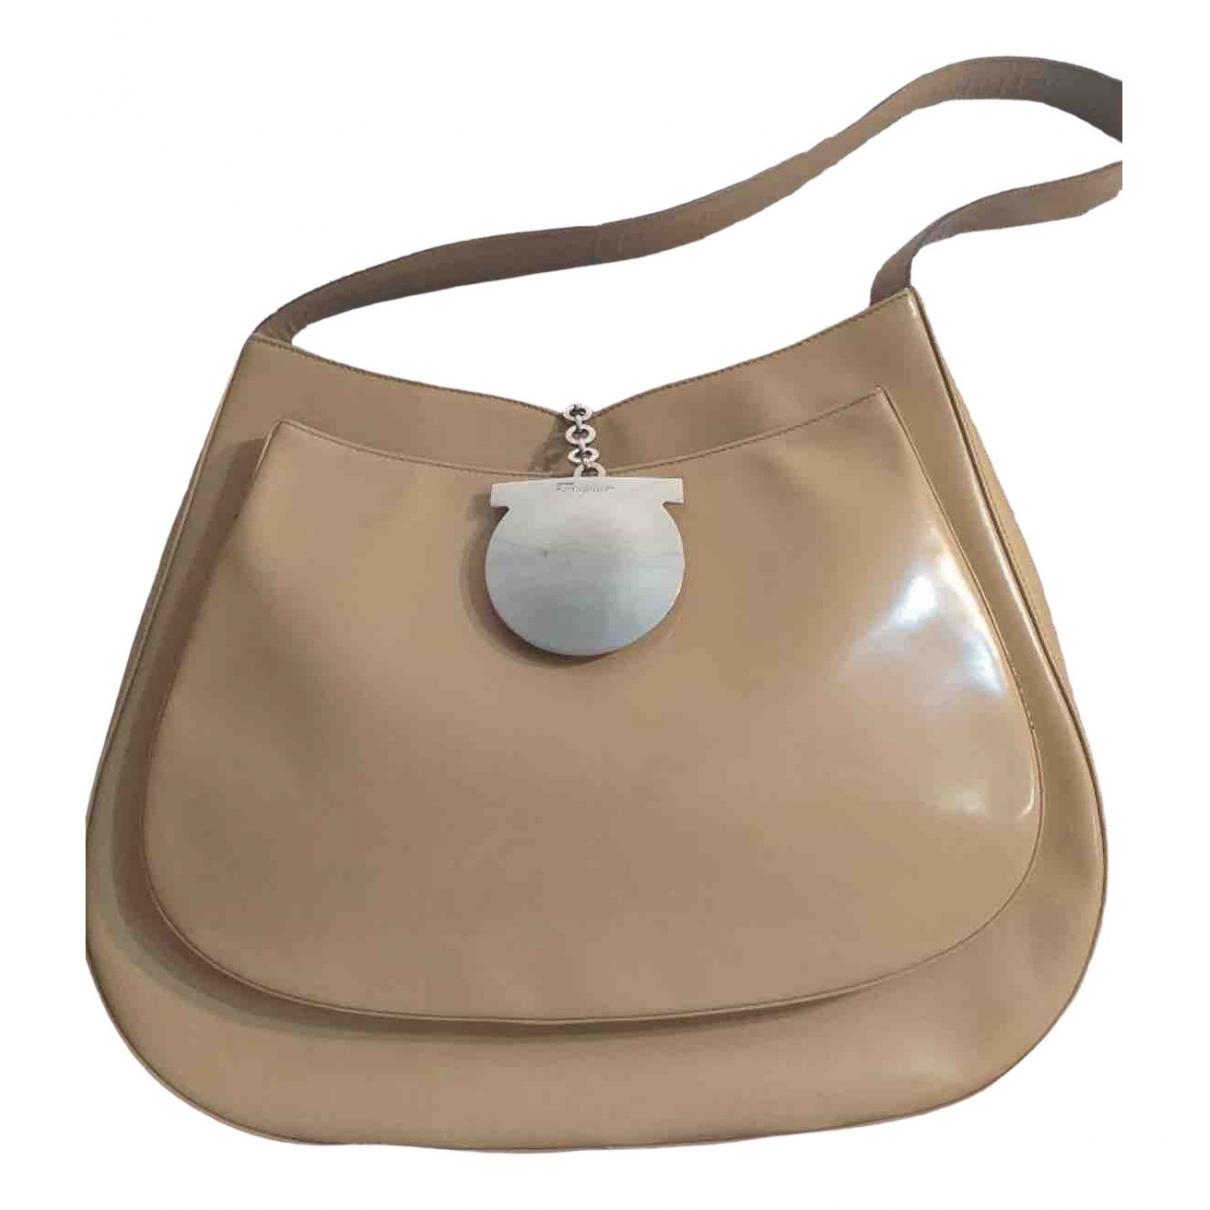 Salvatore Ferragamo \N Beige Leather handbag for Women \N